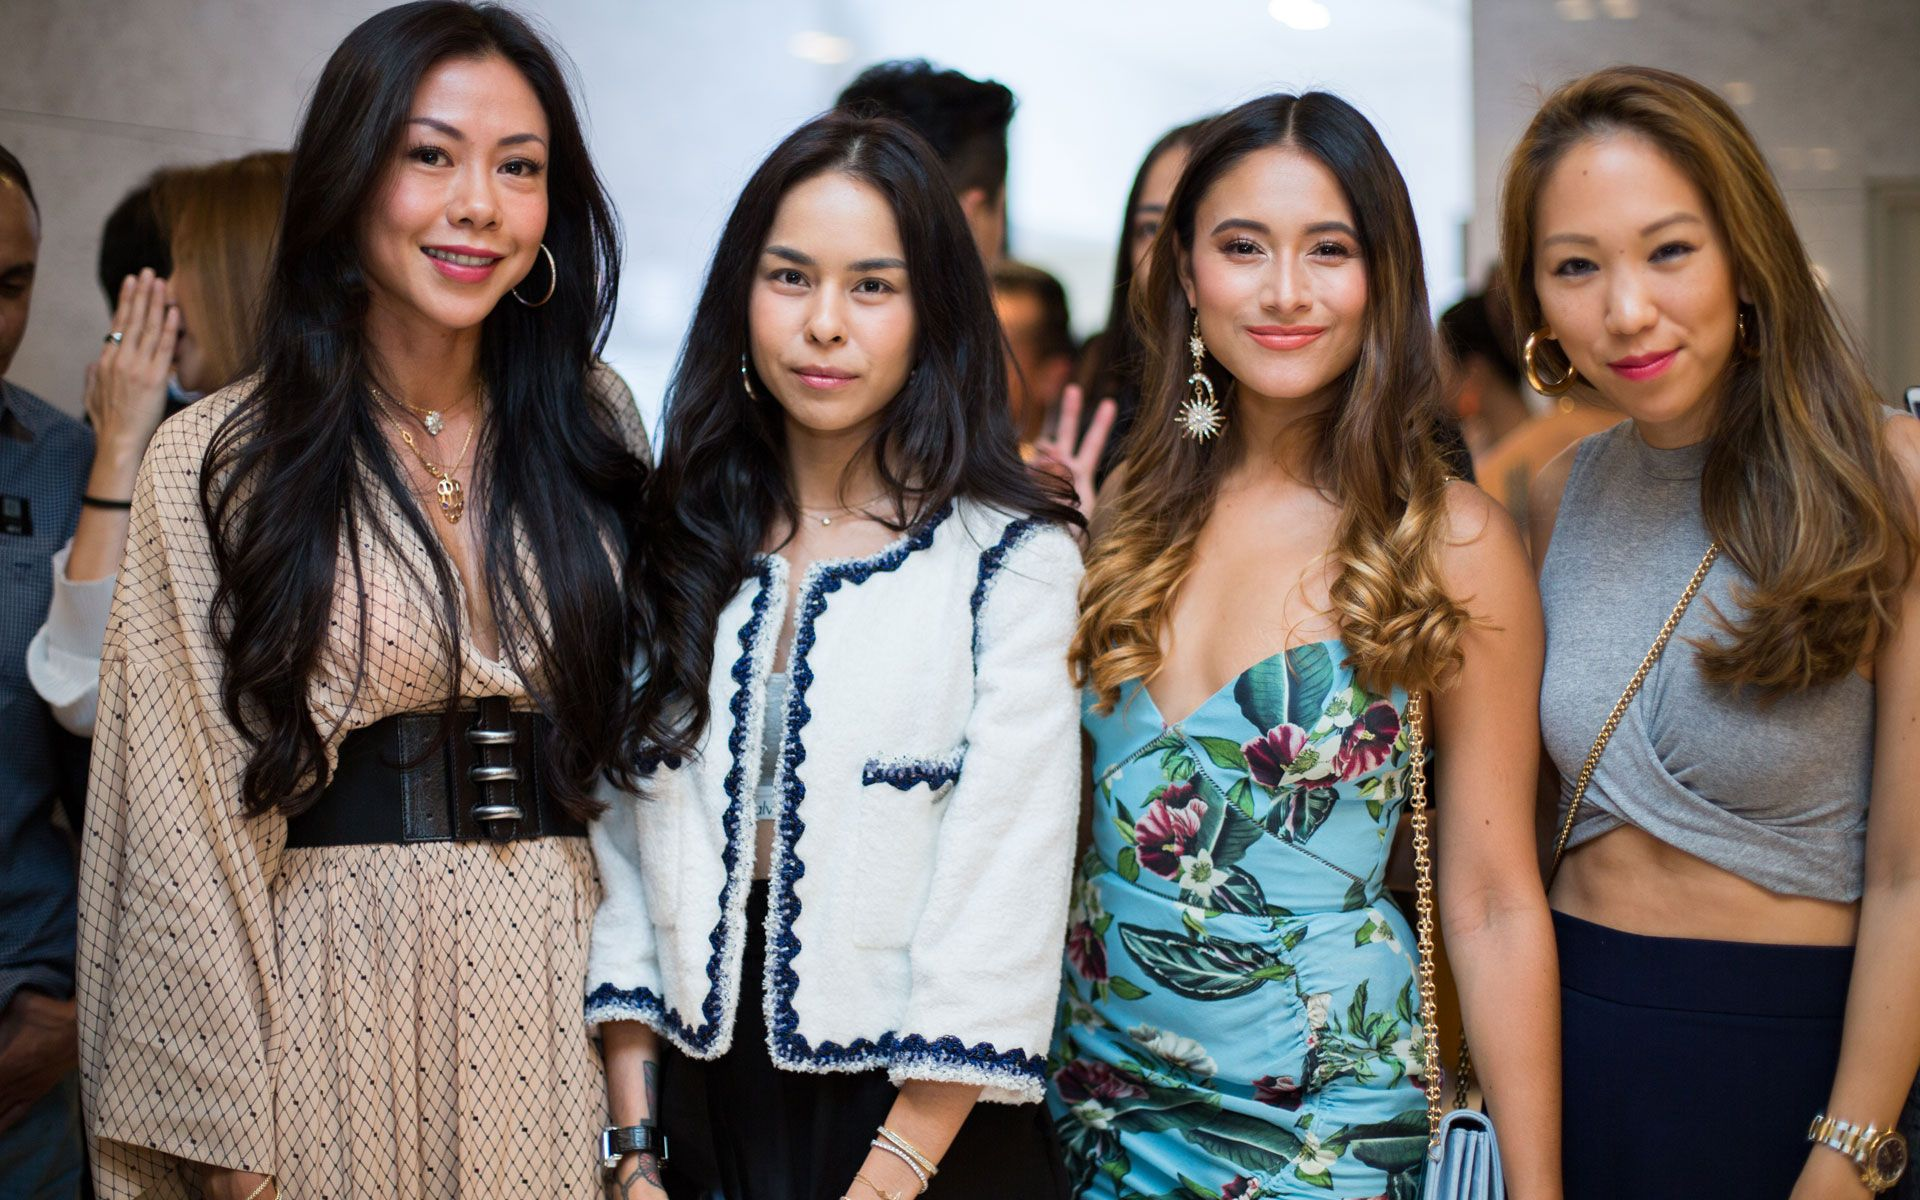 Datin Wira Sabrena Dani, Kim Raymond, Tunku Elana Khyra and Diane Chia